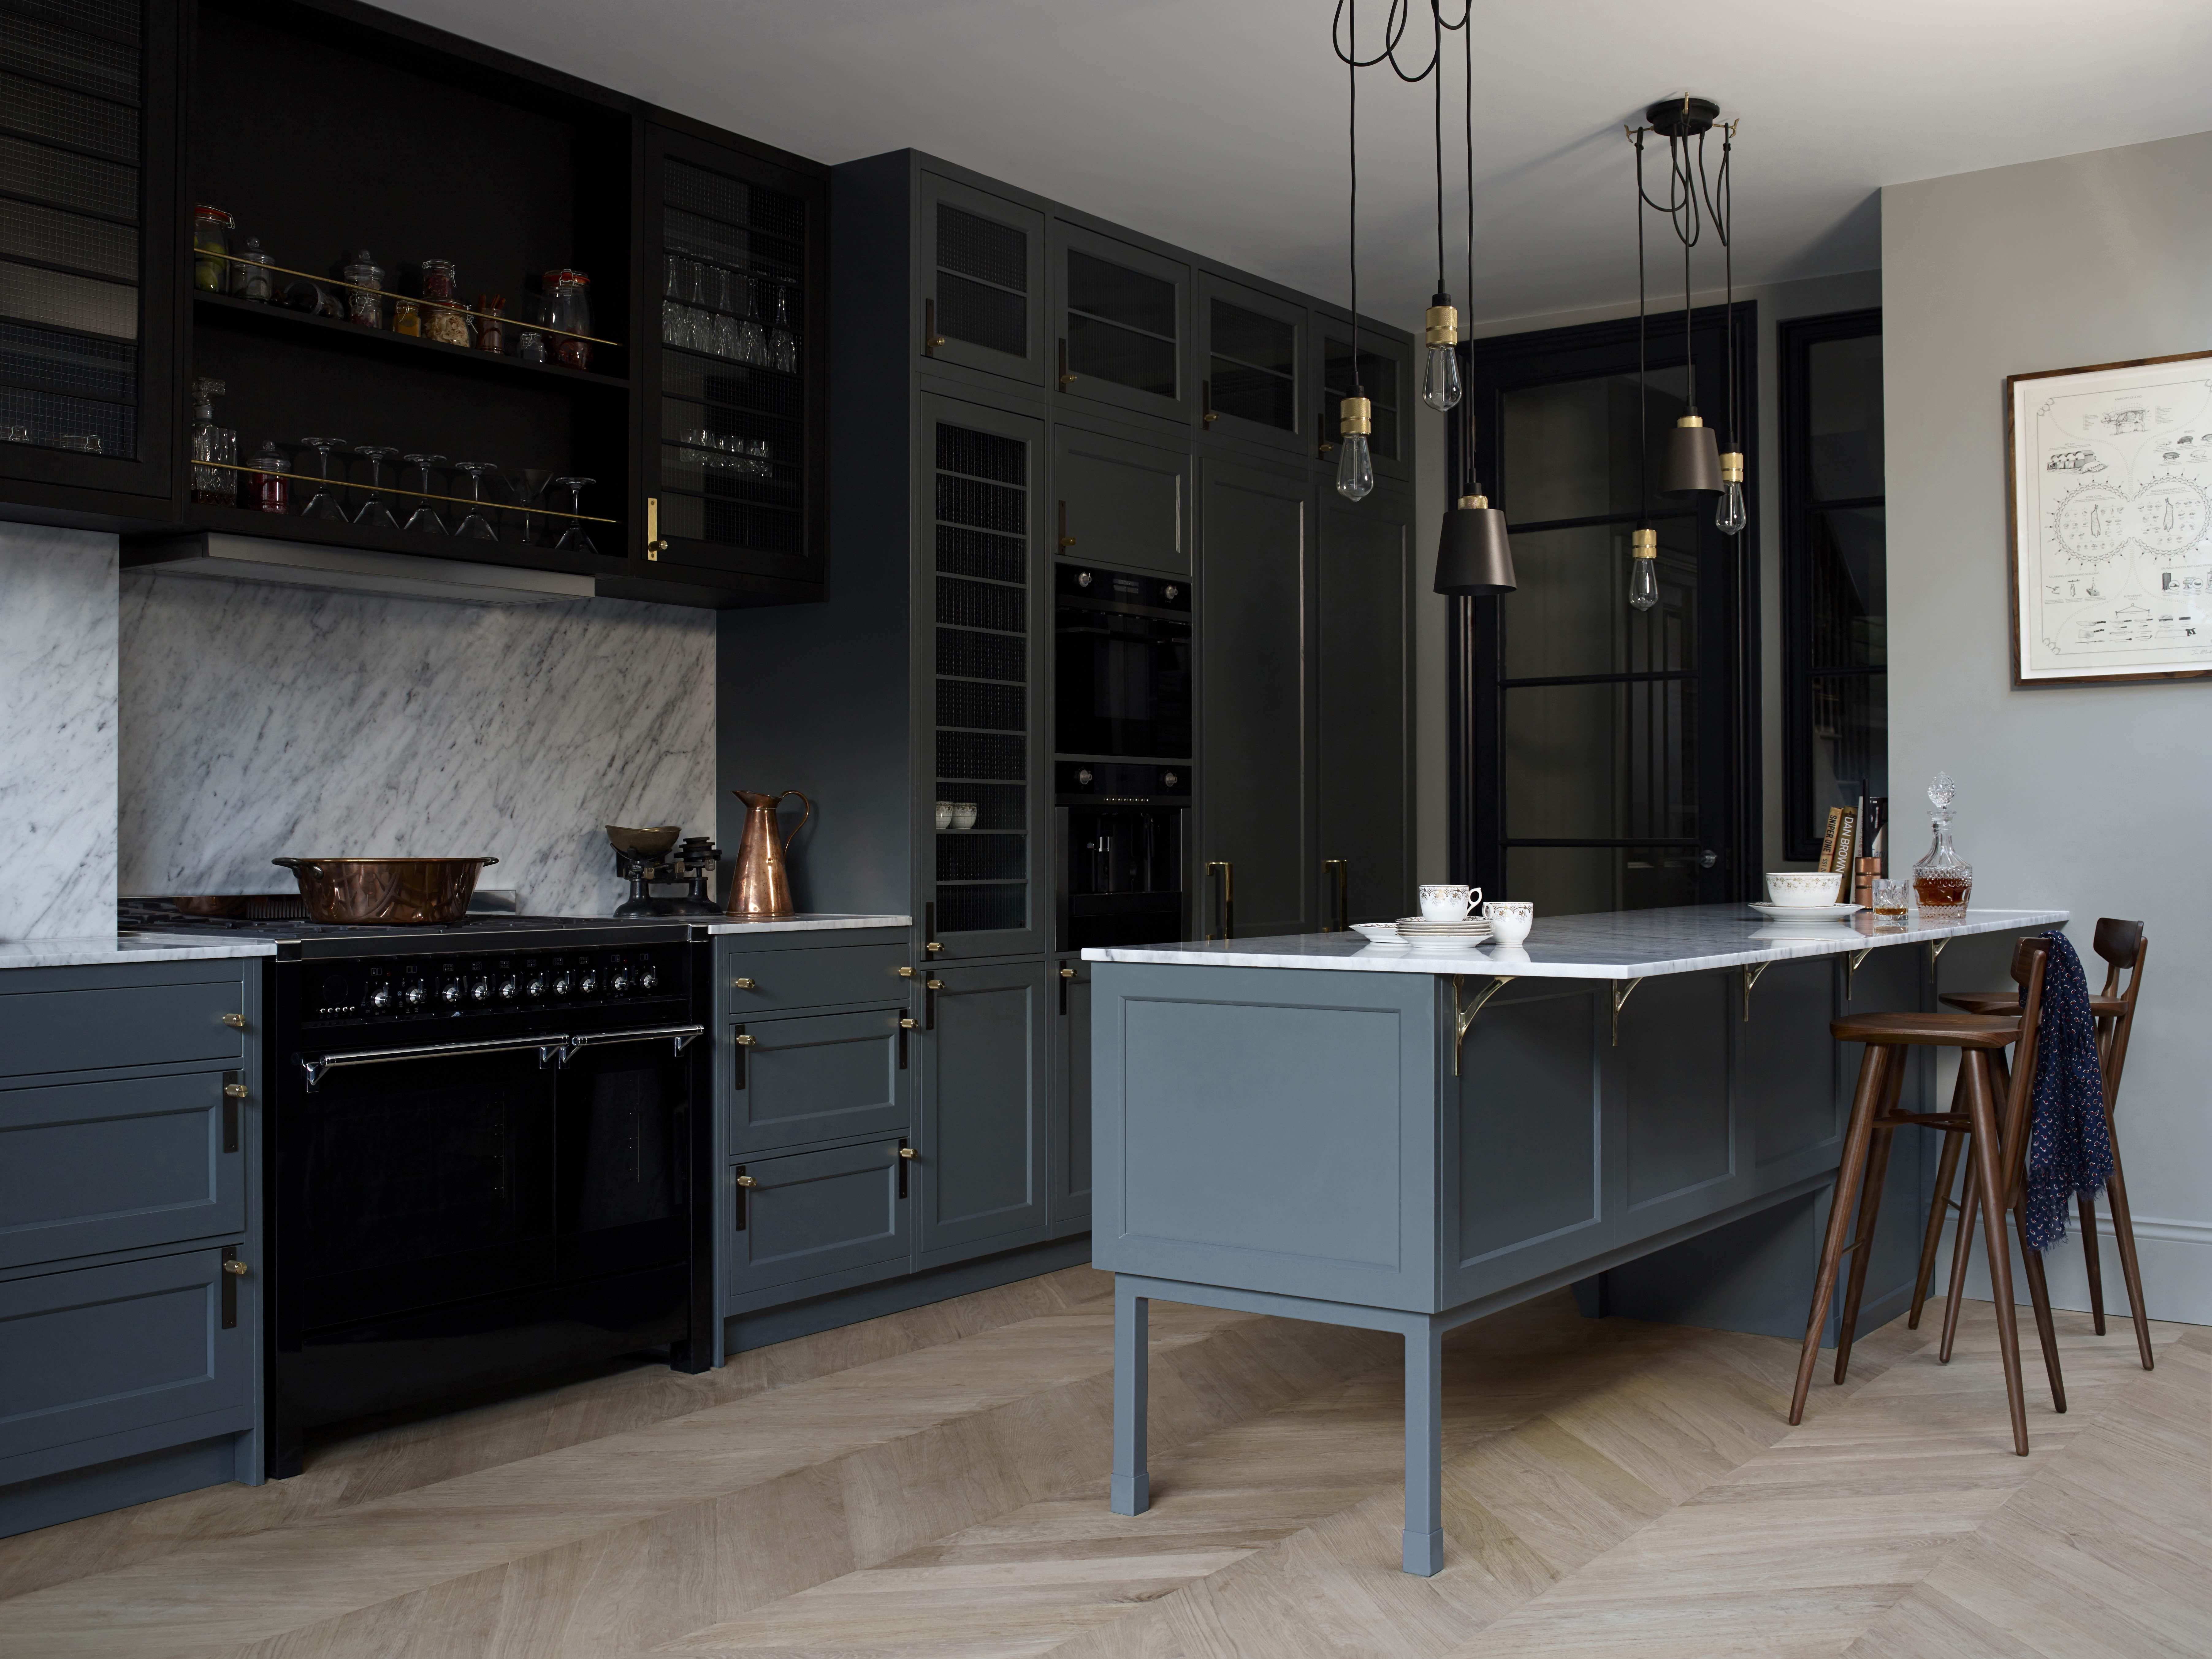 Butchers Kitchen Strathfield : Modern, Contemporary Lifestyle Inspiration - Buster + Punch - The Butcher?s Kitchen